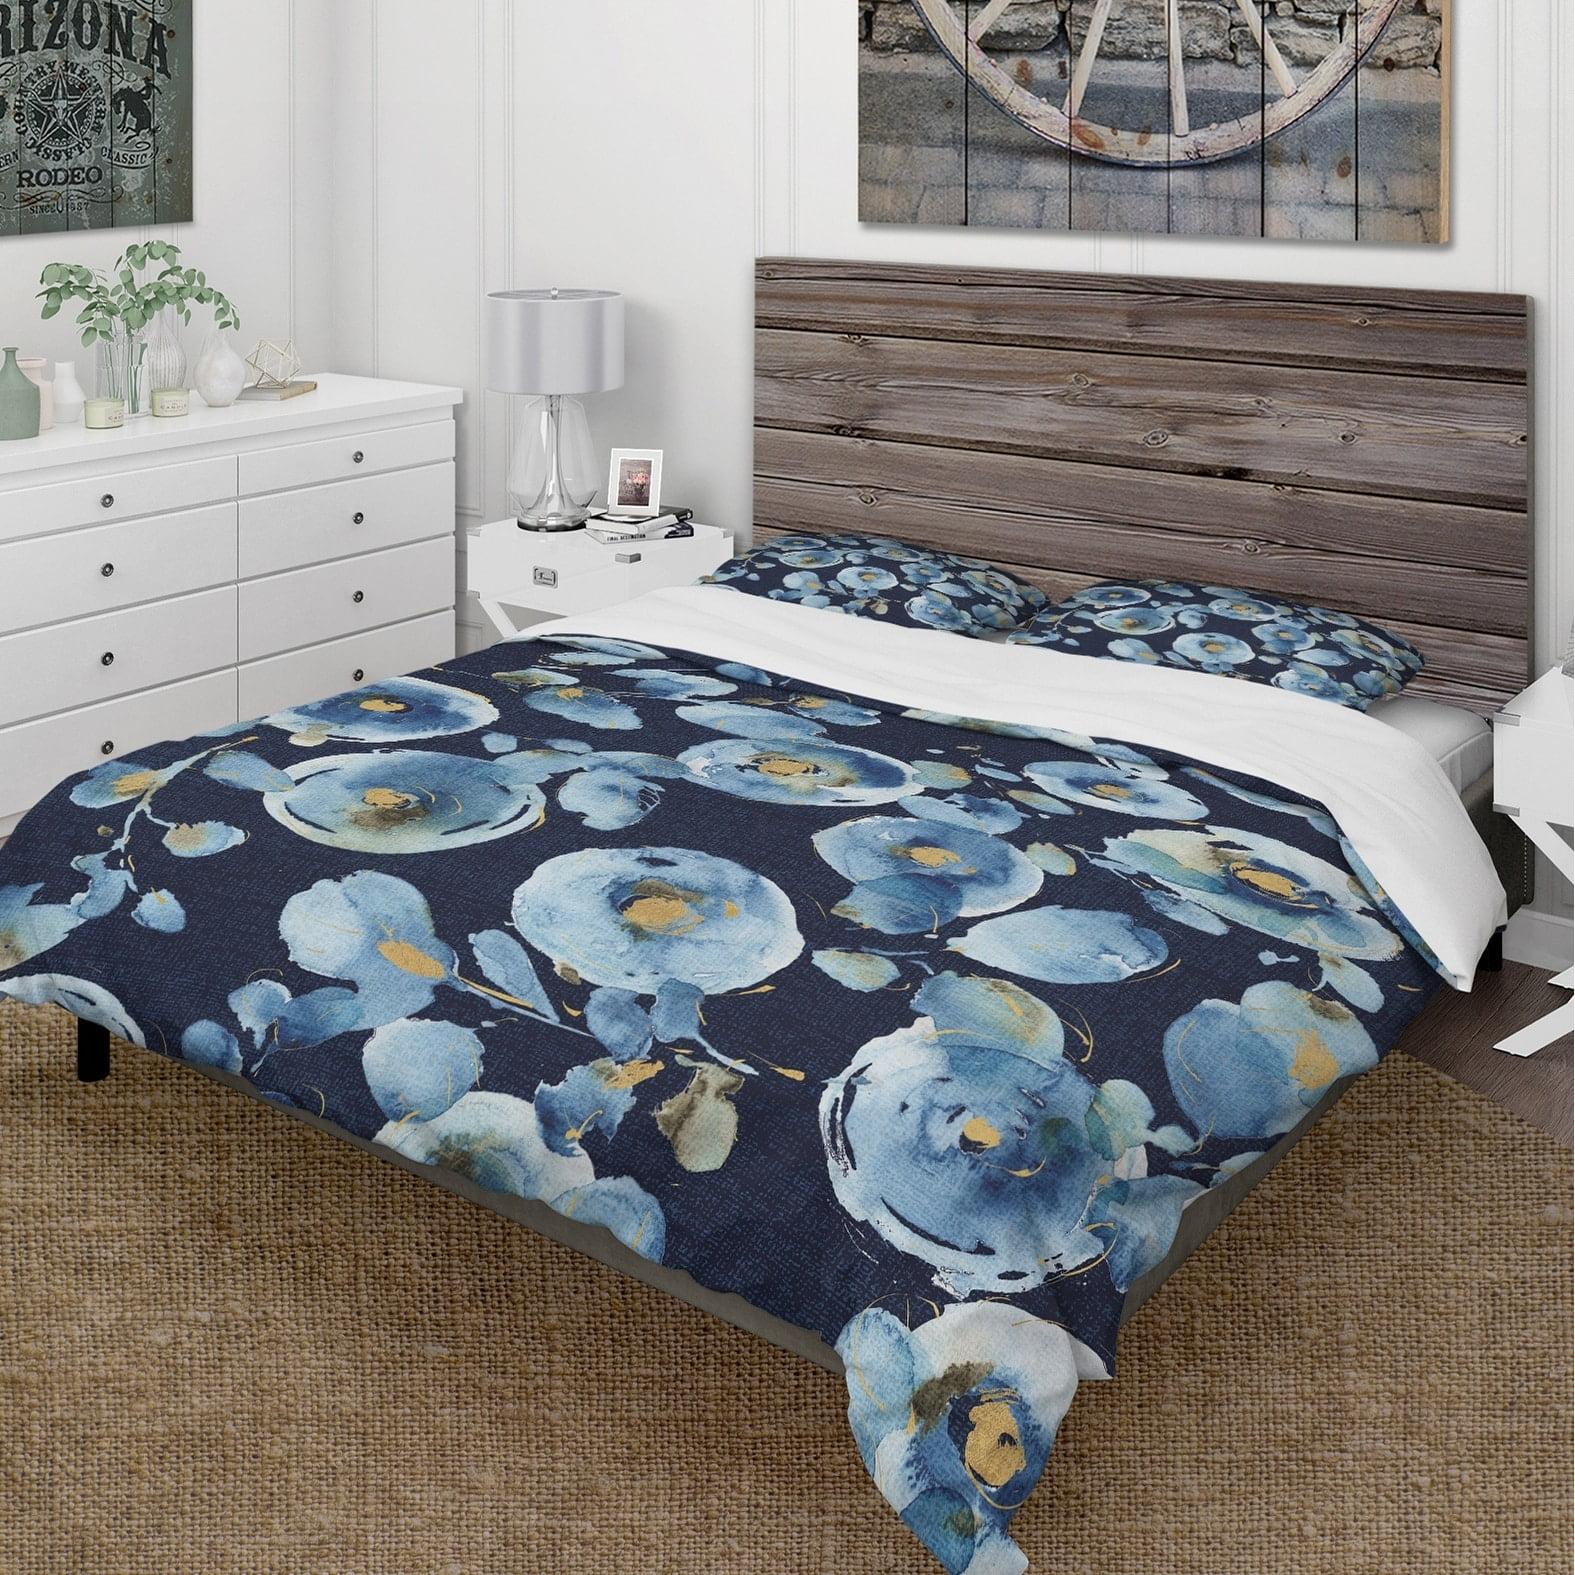 DESIGN ART Designart 'Indigold metallic Flower Pattern' Cottage Bedding Set - Duvet Cover & Shams